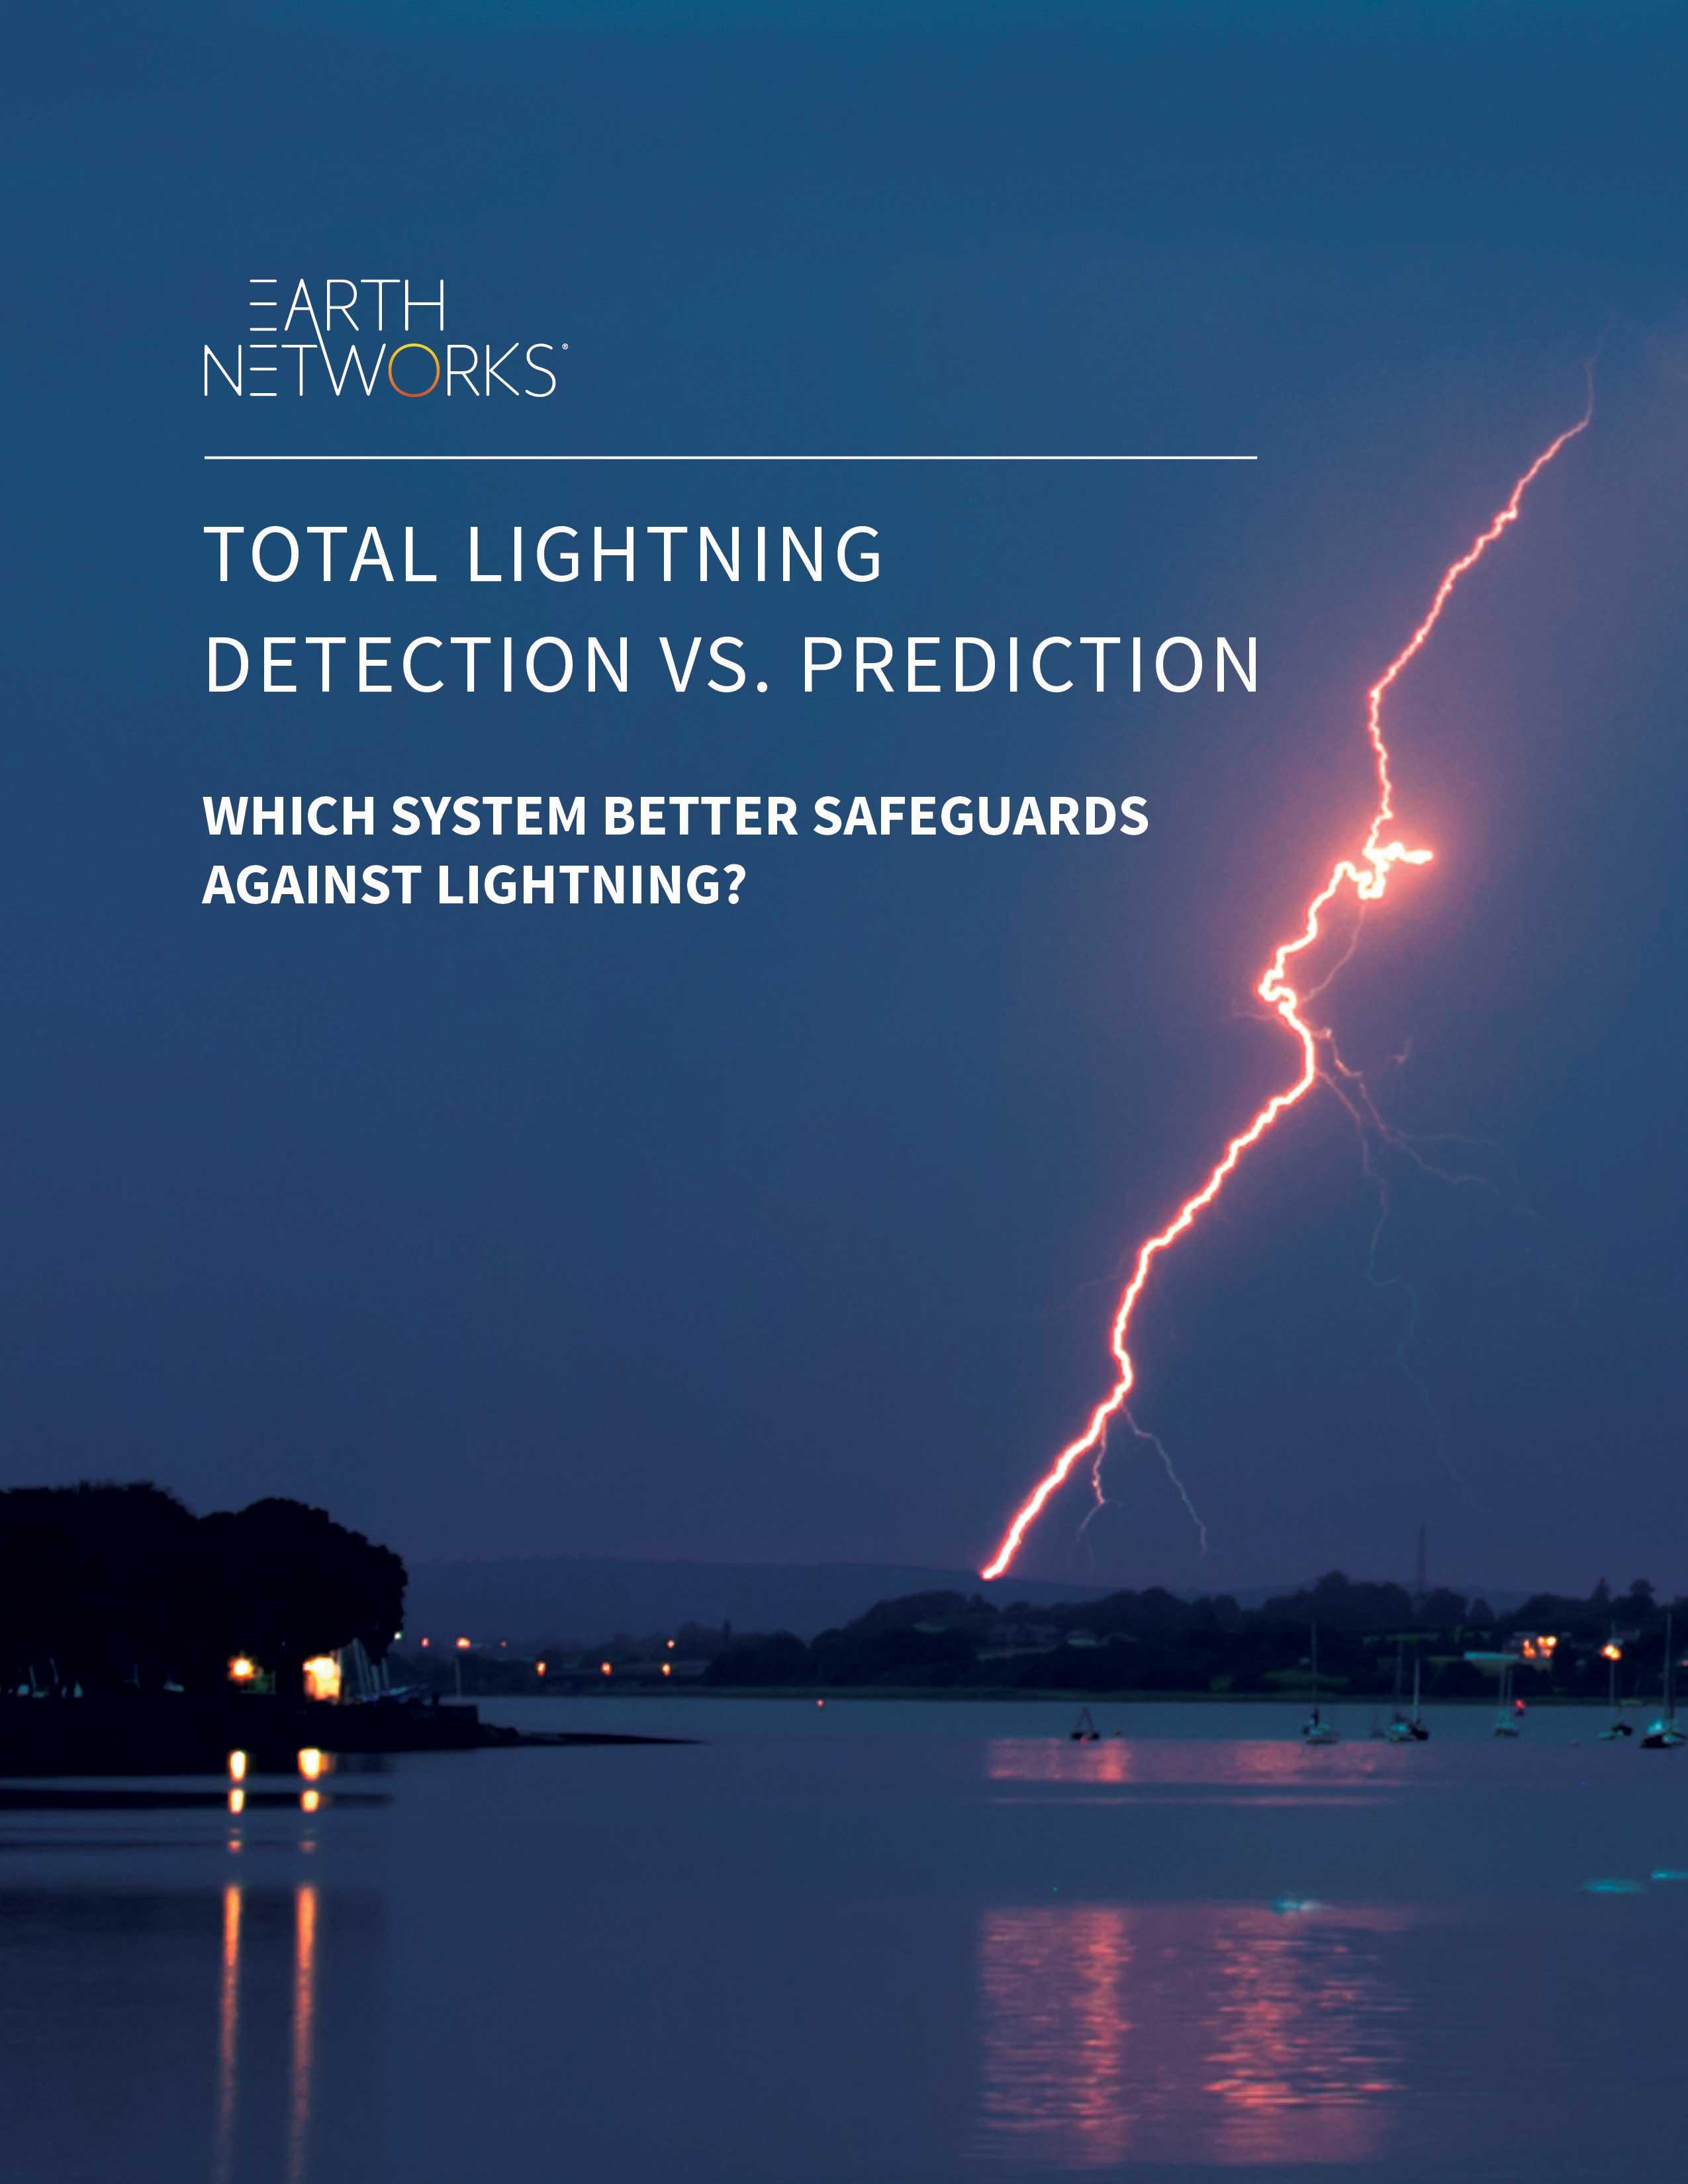 Read the lightning detection vs prediction case study